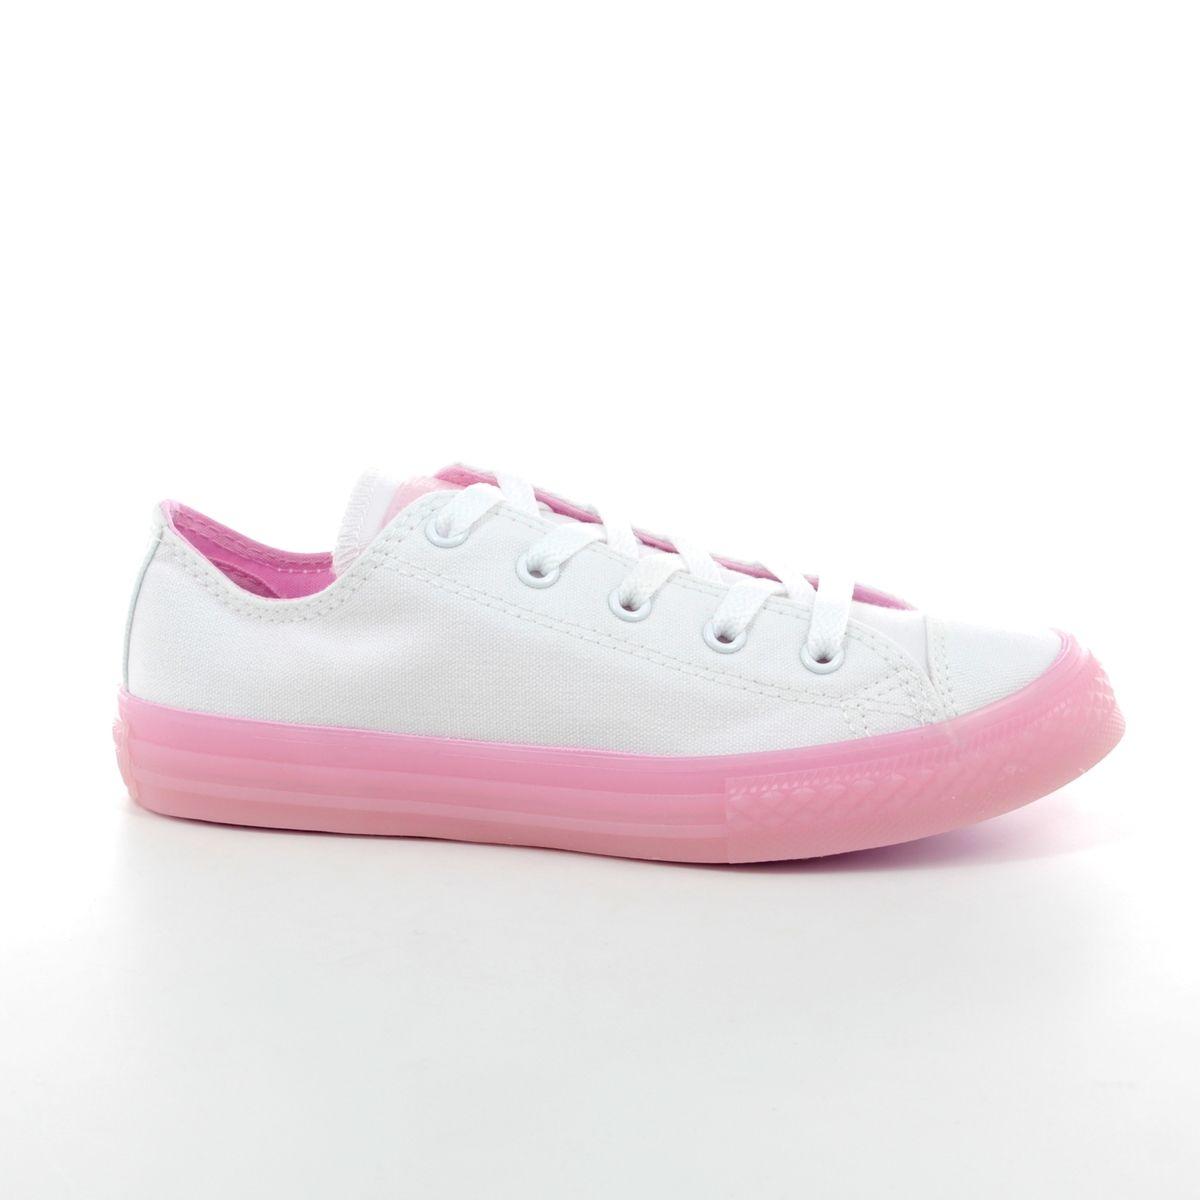 cefb834ac09f Converse Trainers - White-Pink combi - 660719C 100 ALLSTAR OX JNR